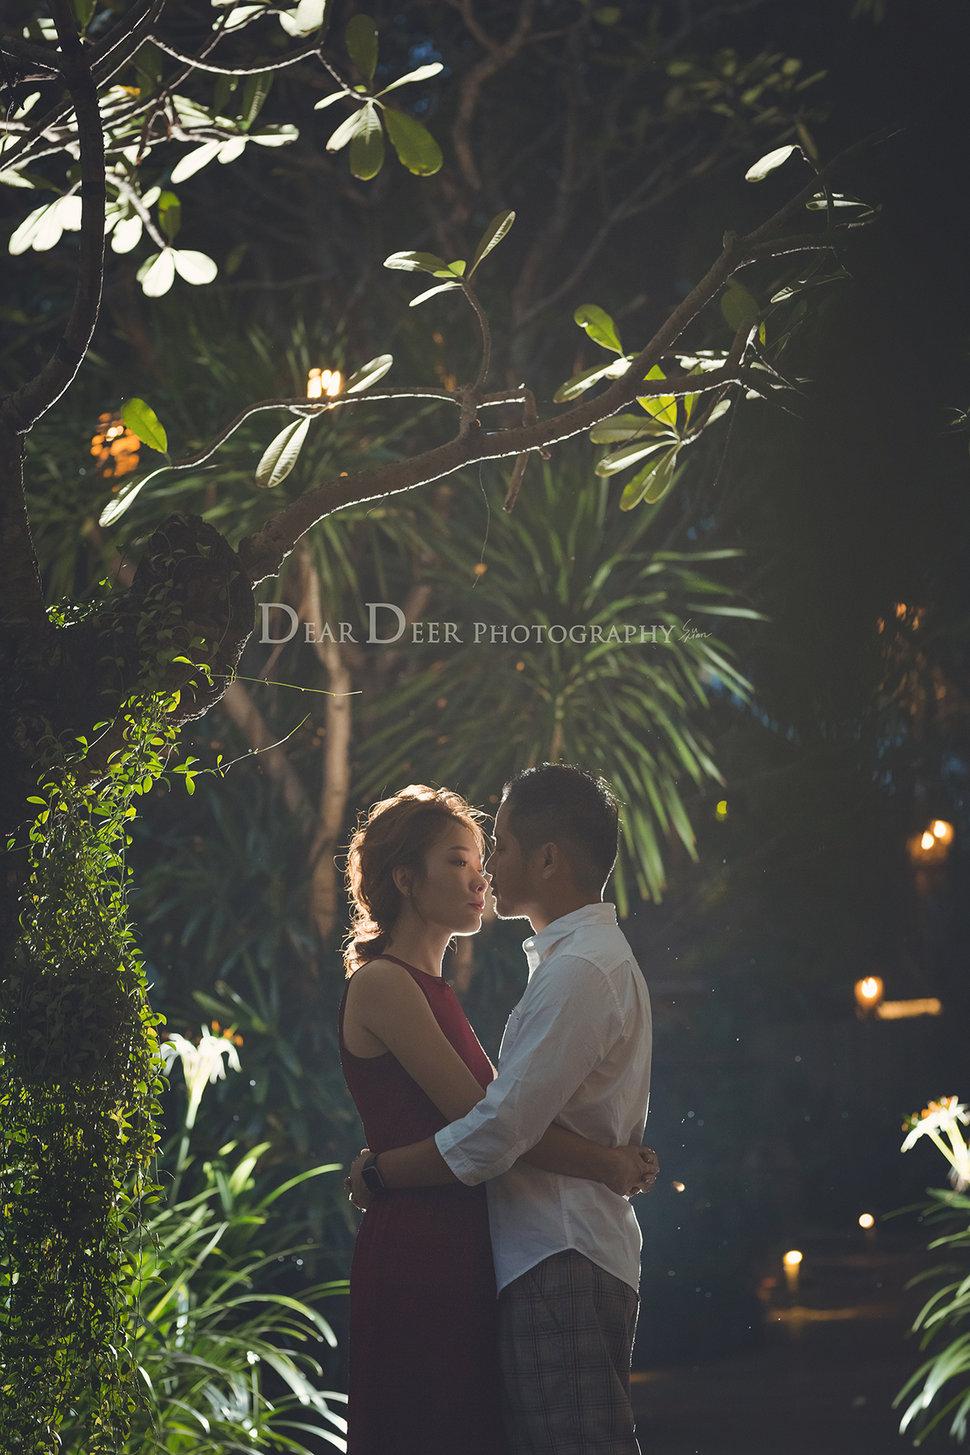 Dear Deer|電影劇照風格(編號:2843679) - Dear Deer鹿兒攝影|女攝影師蘇蔓 - 結婚吧